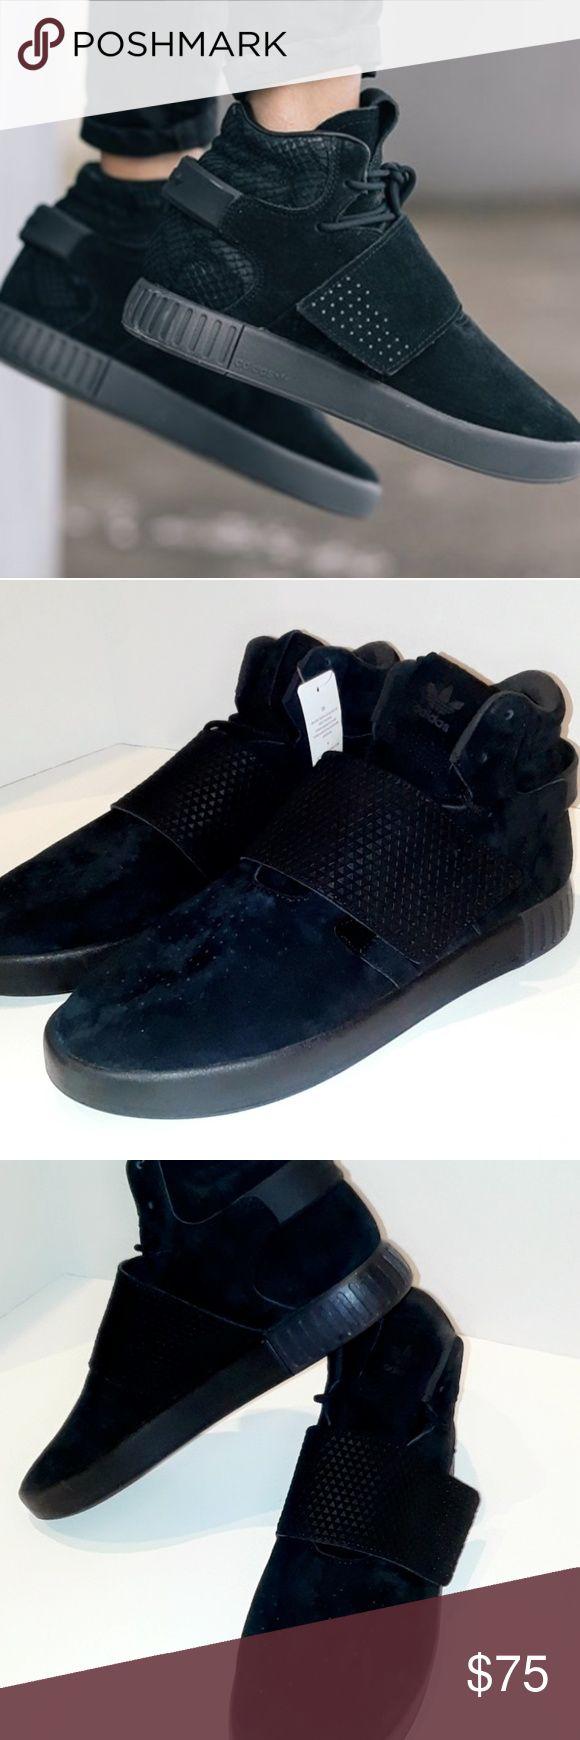 Adidas tubular invader strap all black sneakers